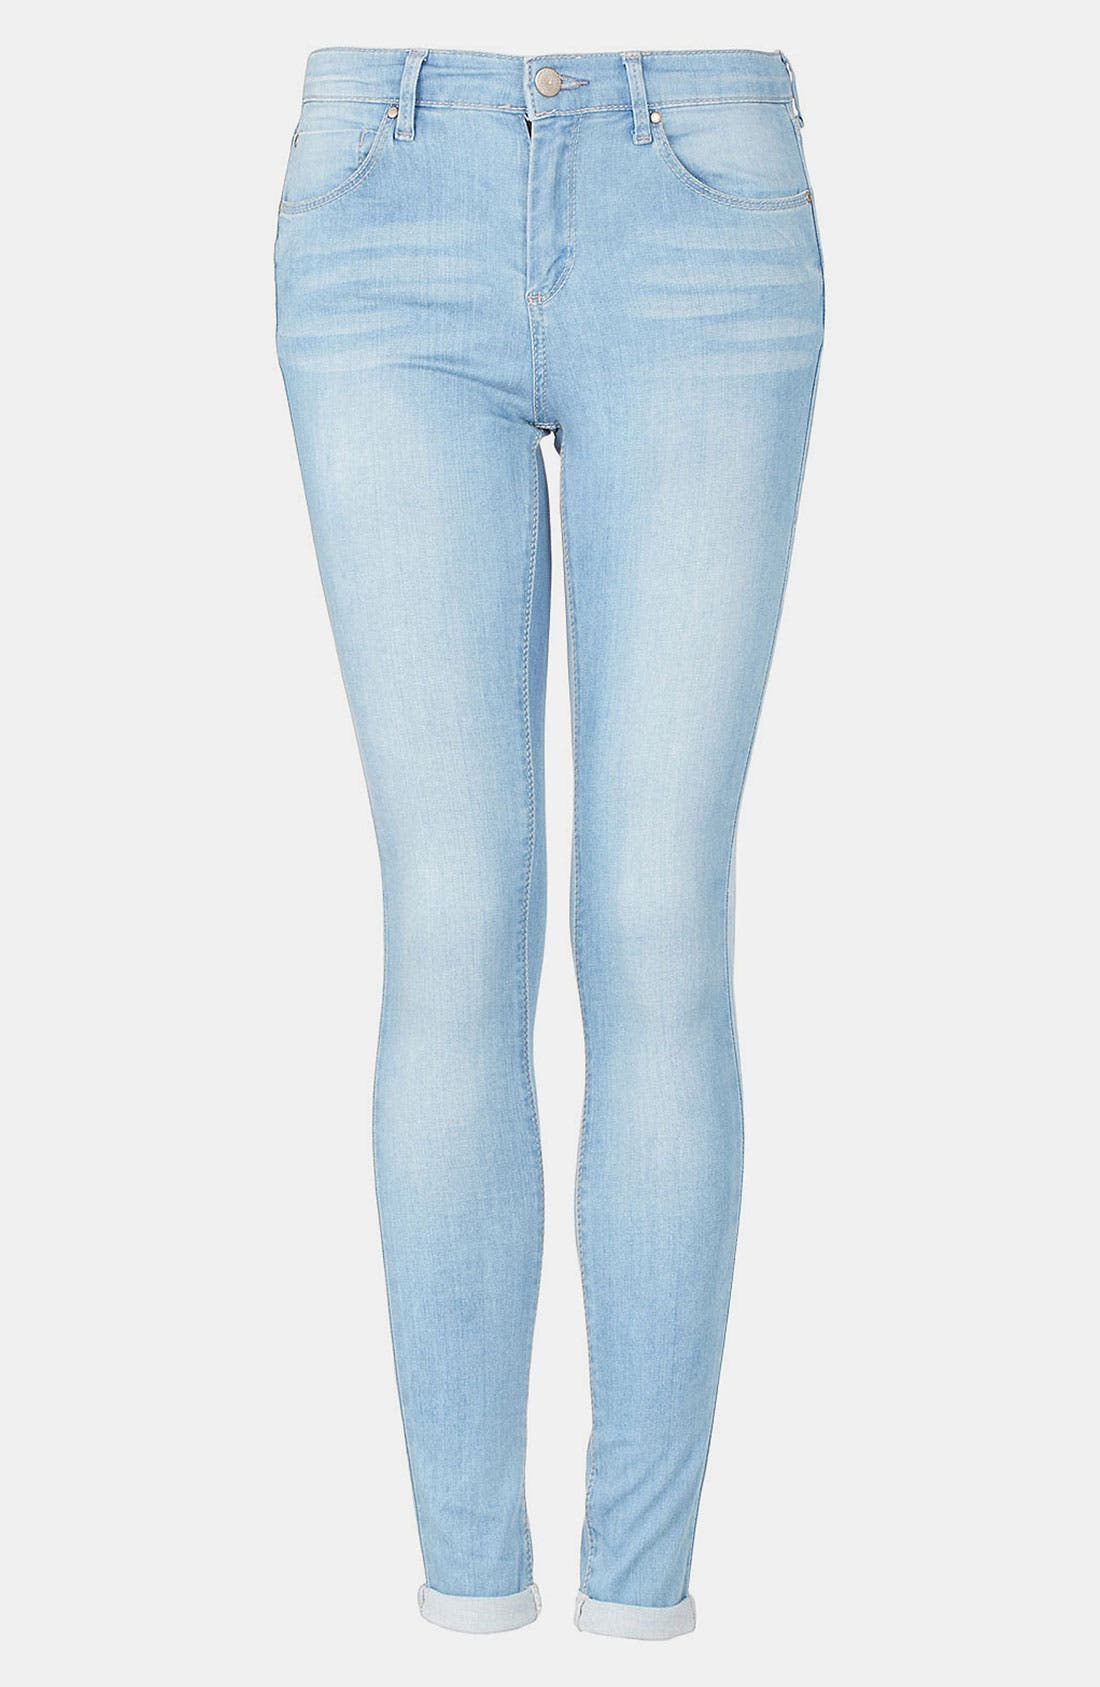 Alternate Image 1 Selected - Topshop Moto 'Leigh' Bleach Wash Skinny Jeans (Long)